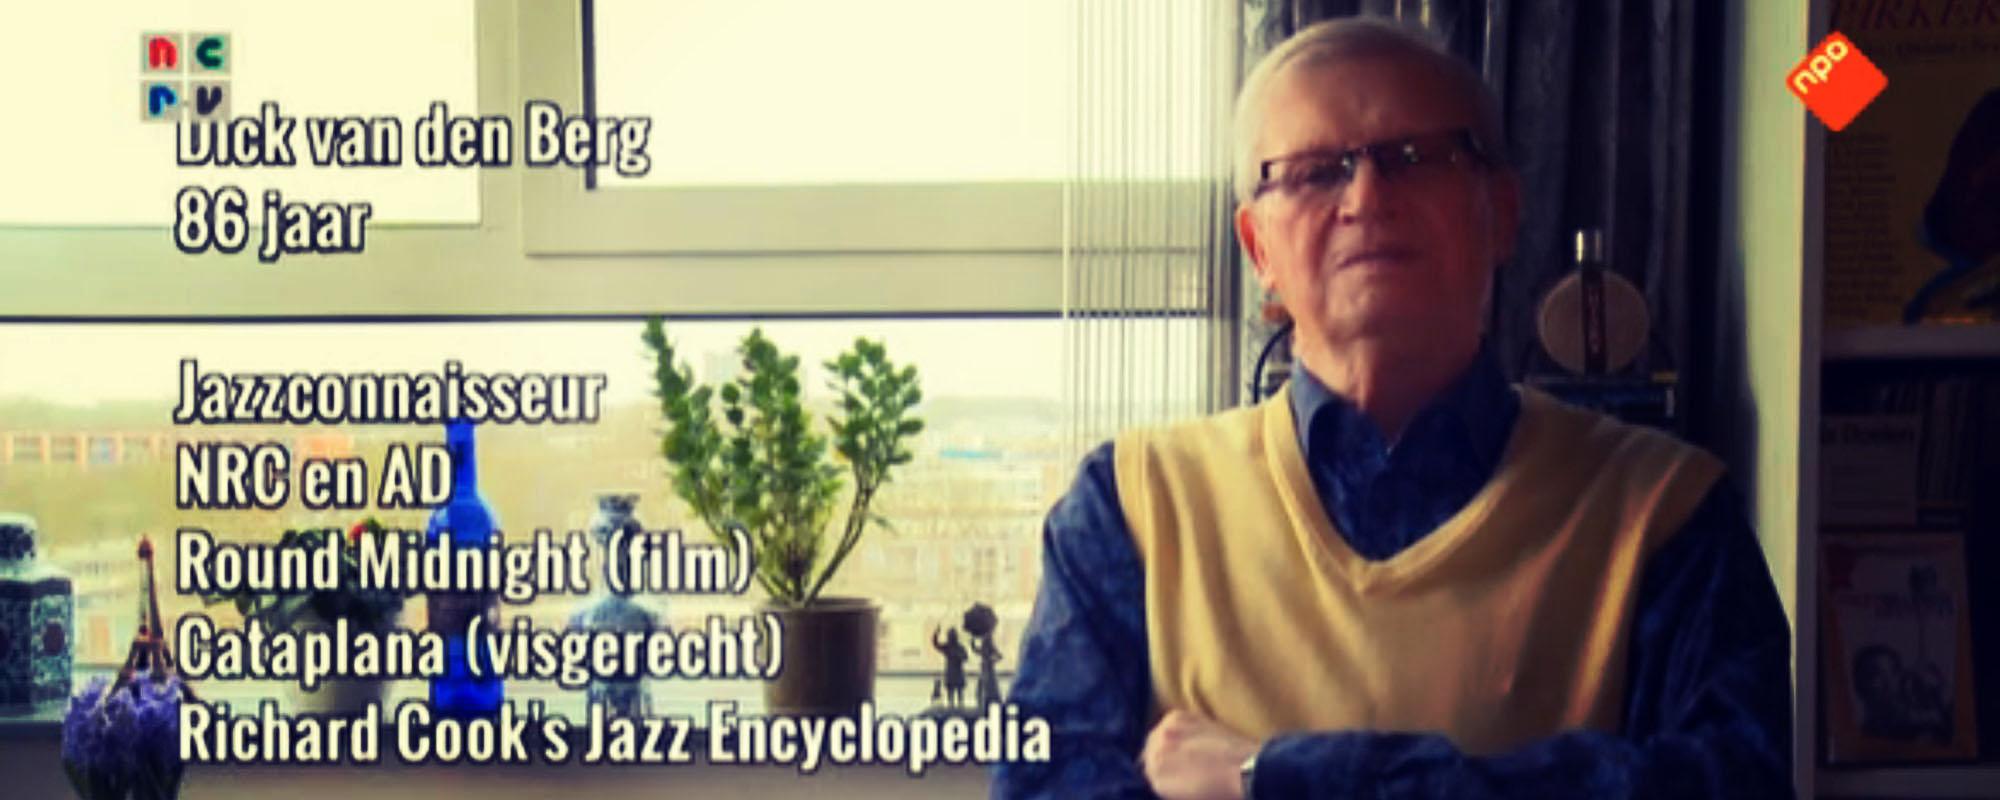 Biggiebanner_0000s_0000s_0003_dick on jazz